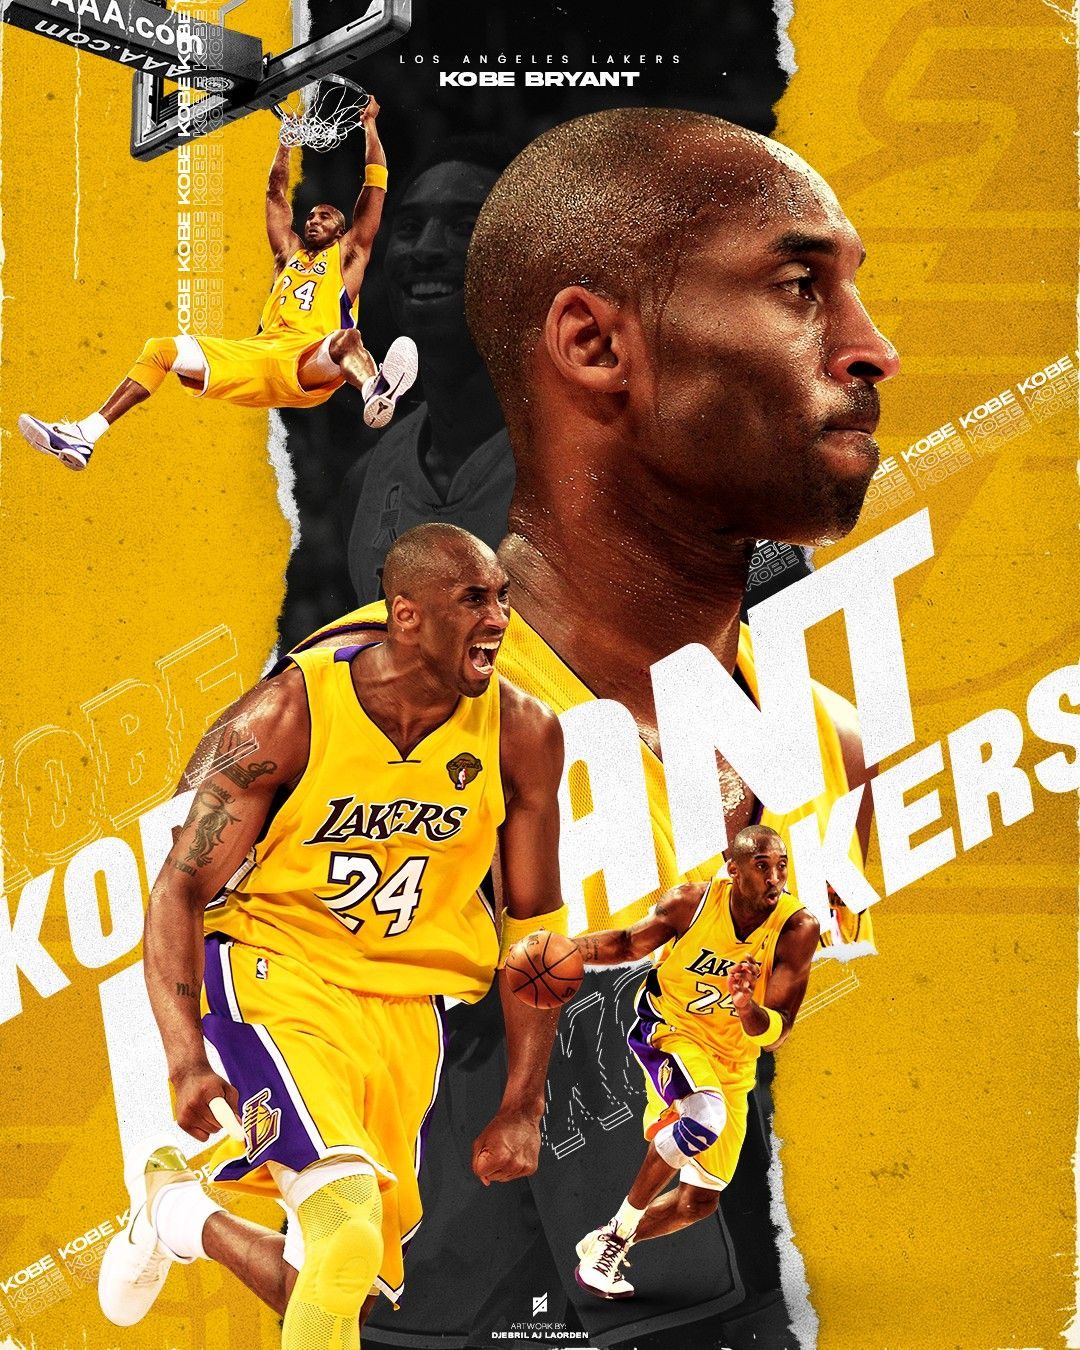 Djebril On Instagram Kobe Bryant Art In 2020 Kobe Bryant Kobe Bryant Wallpaper Kobe